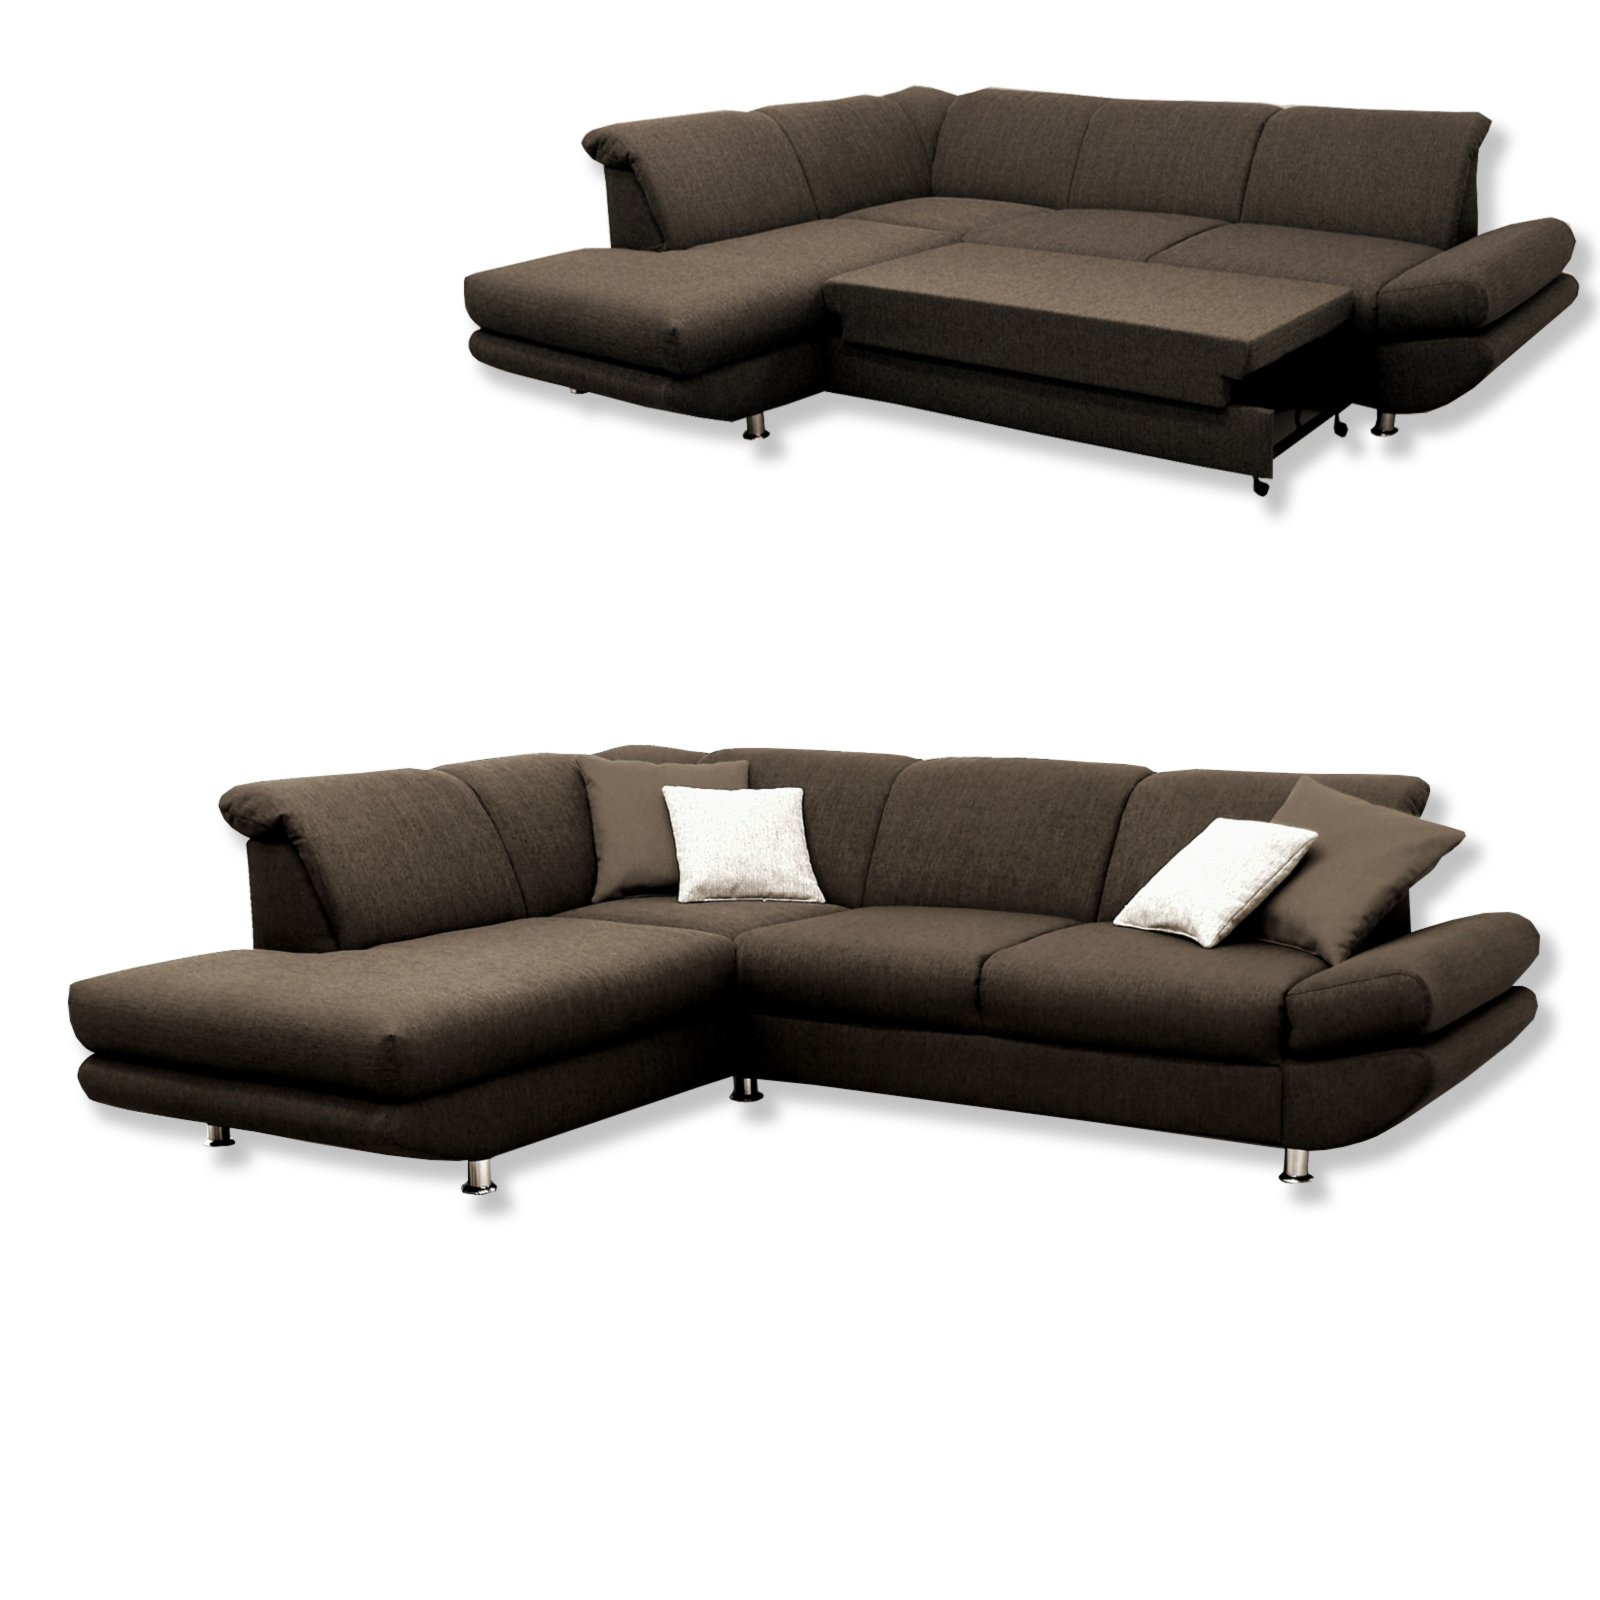 polsterecke braun liegefunktion ottomane links ecksofas l form sofas couches m bel. Black Bedroom Furniture Sets. Home Design Ideas